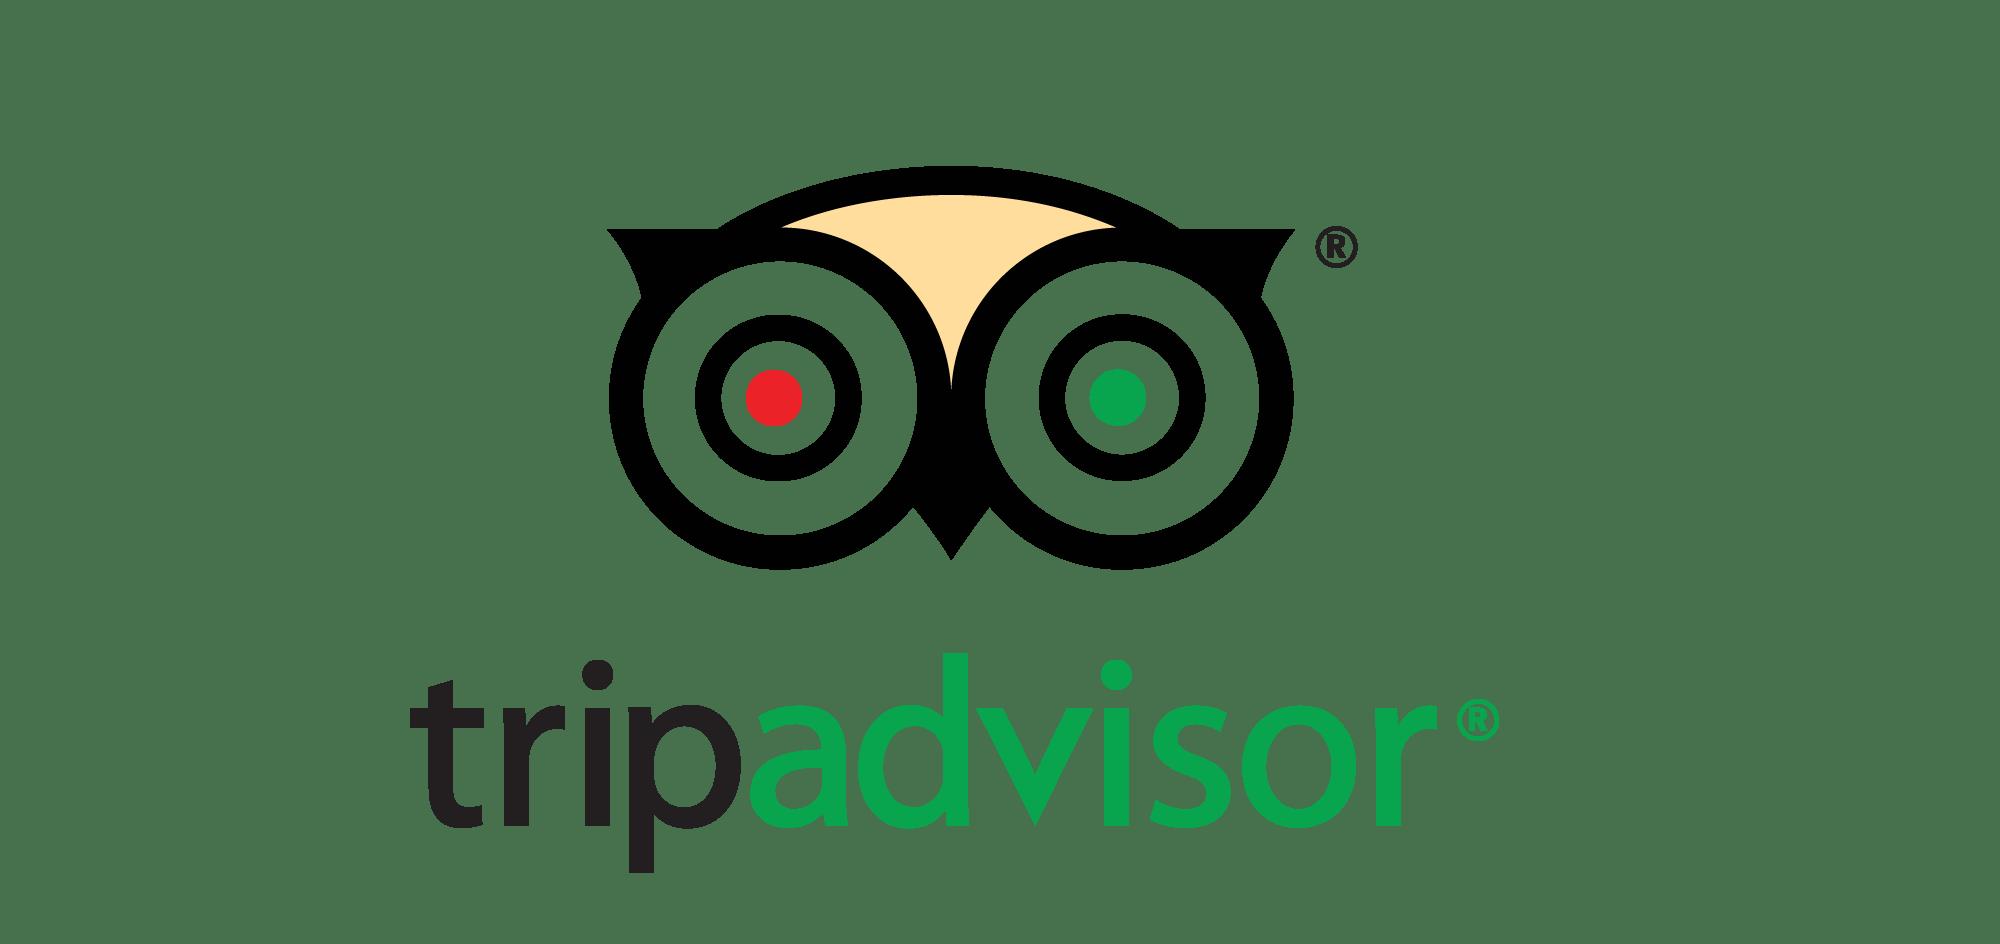 trip-advisor-logo-png